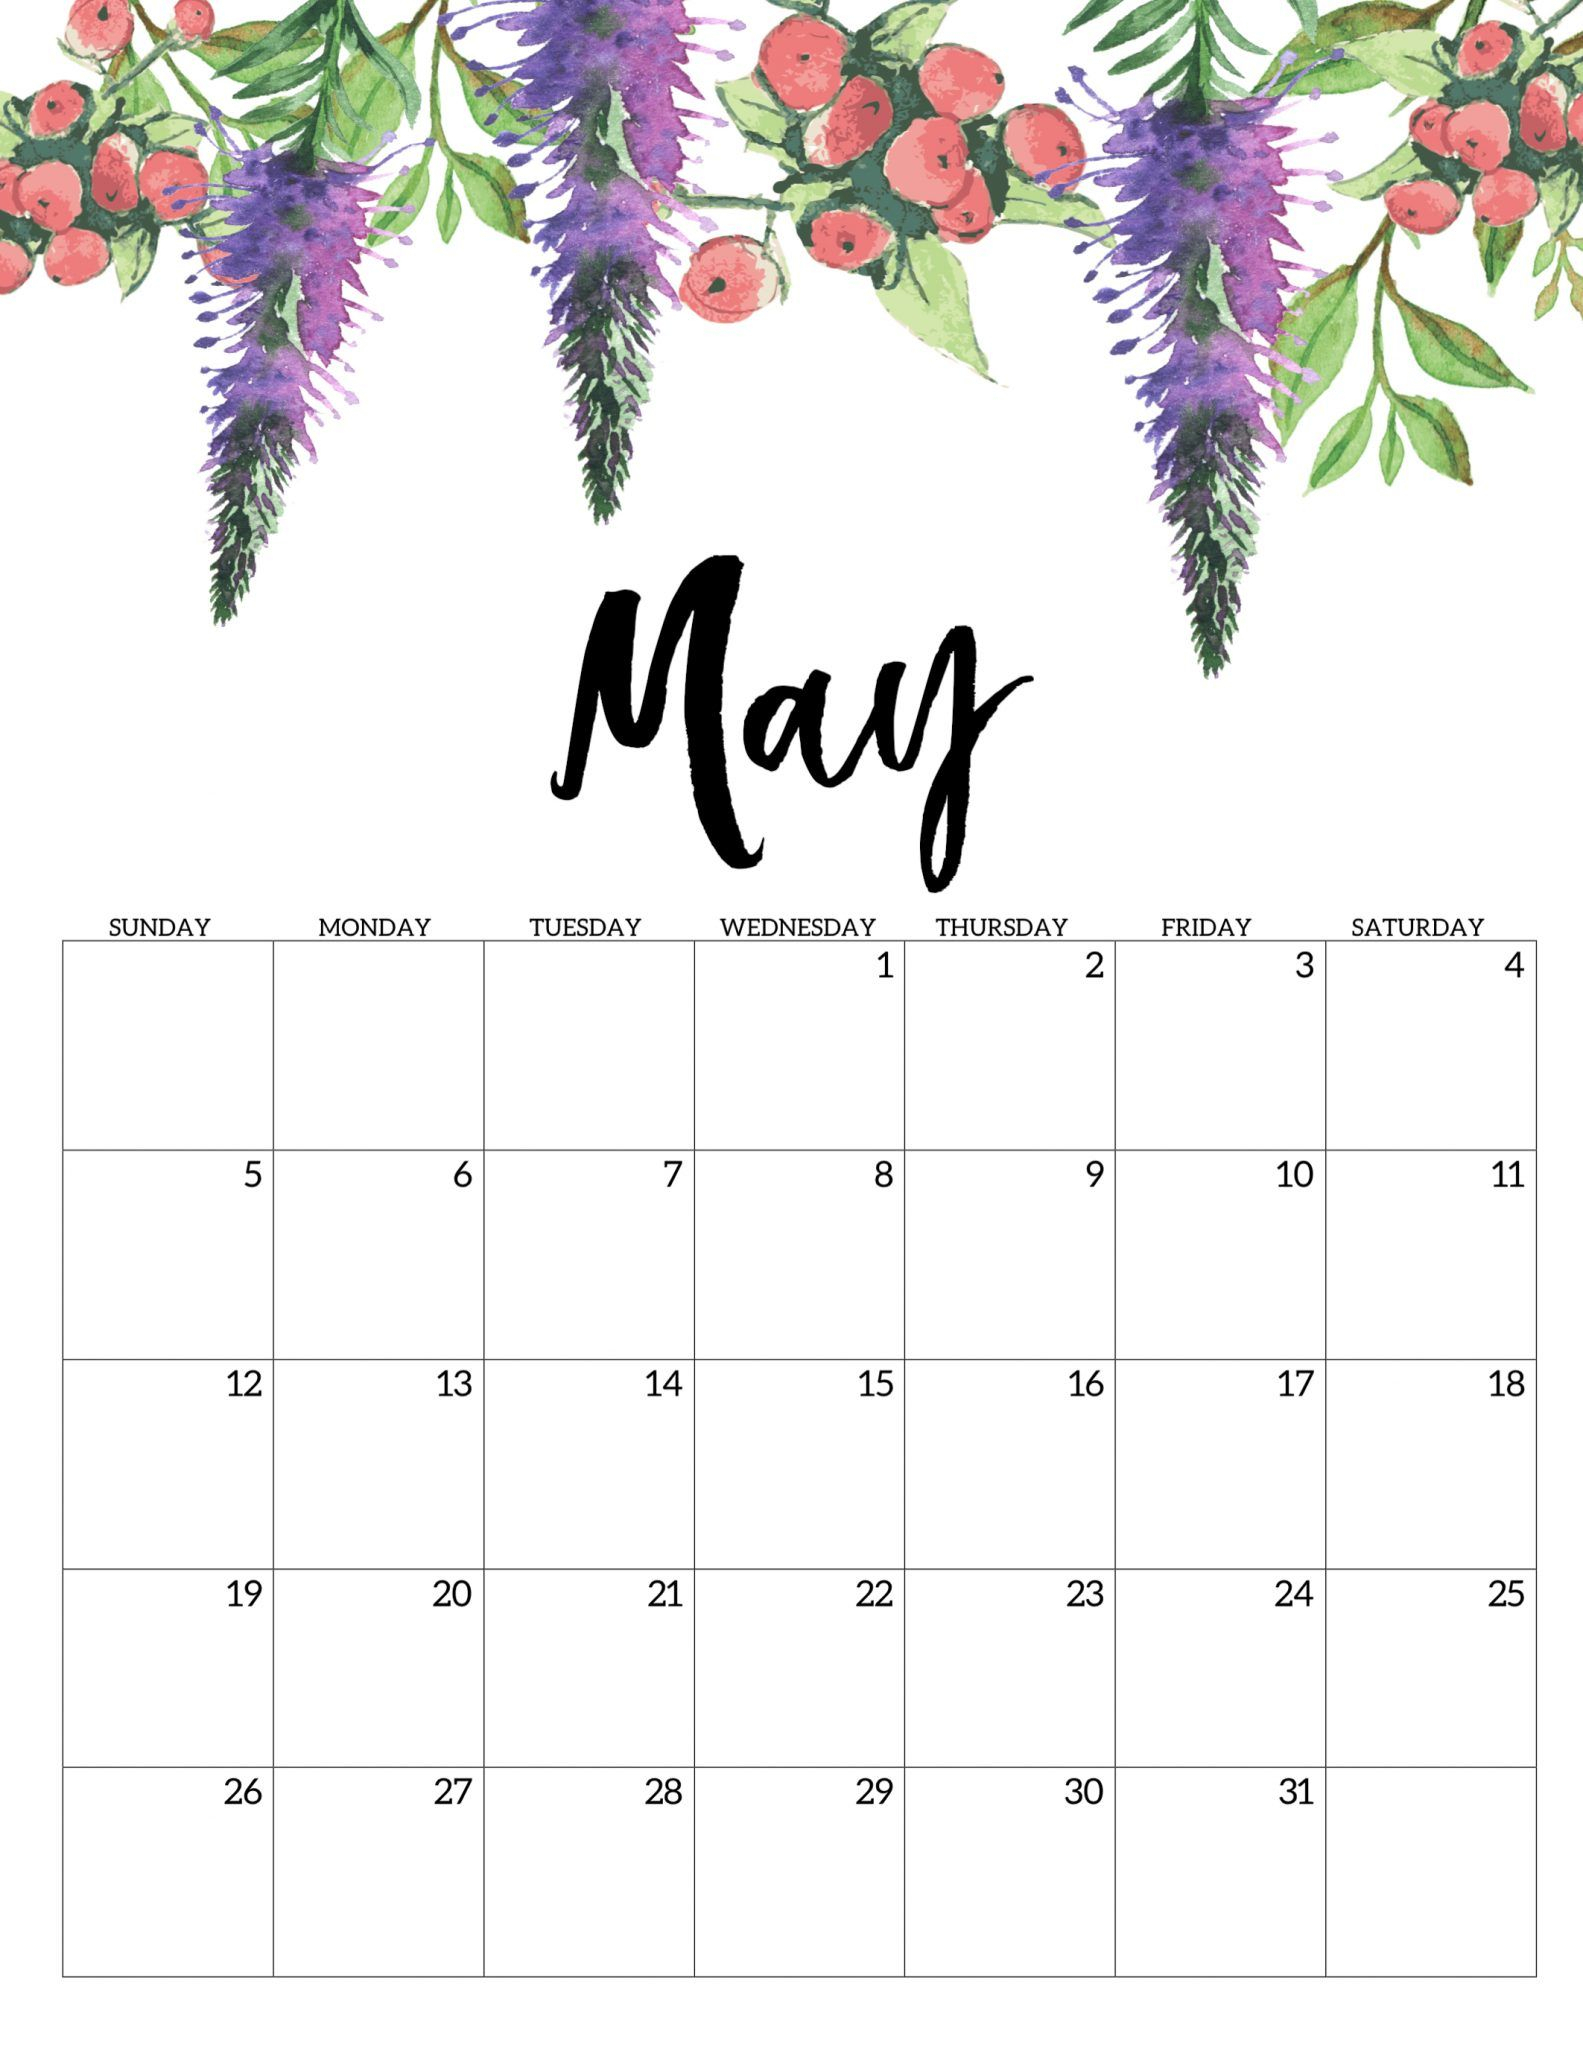 Month Of May 2019 Printable Calendar - Free Printable Calendar